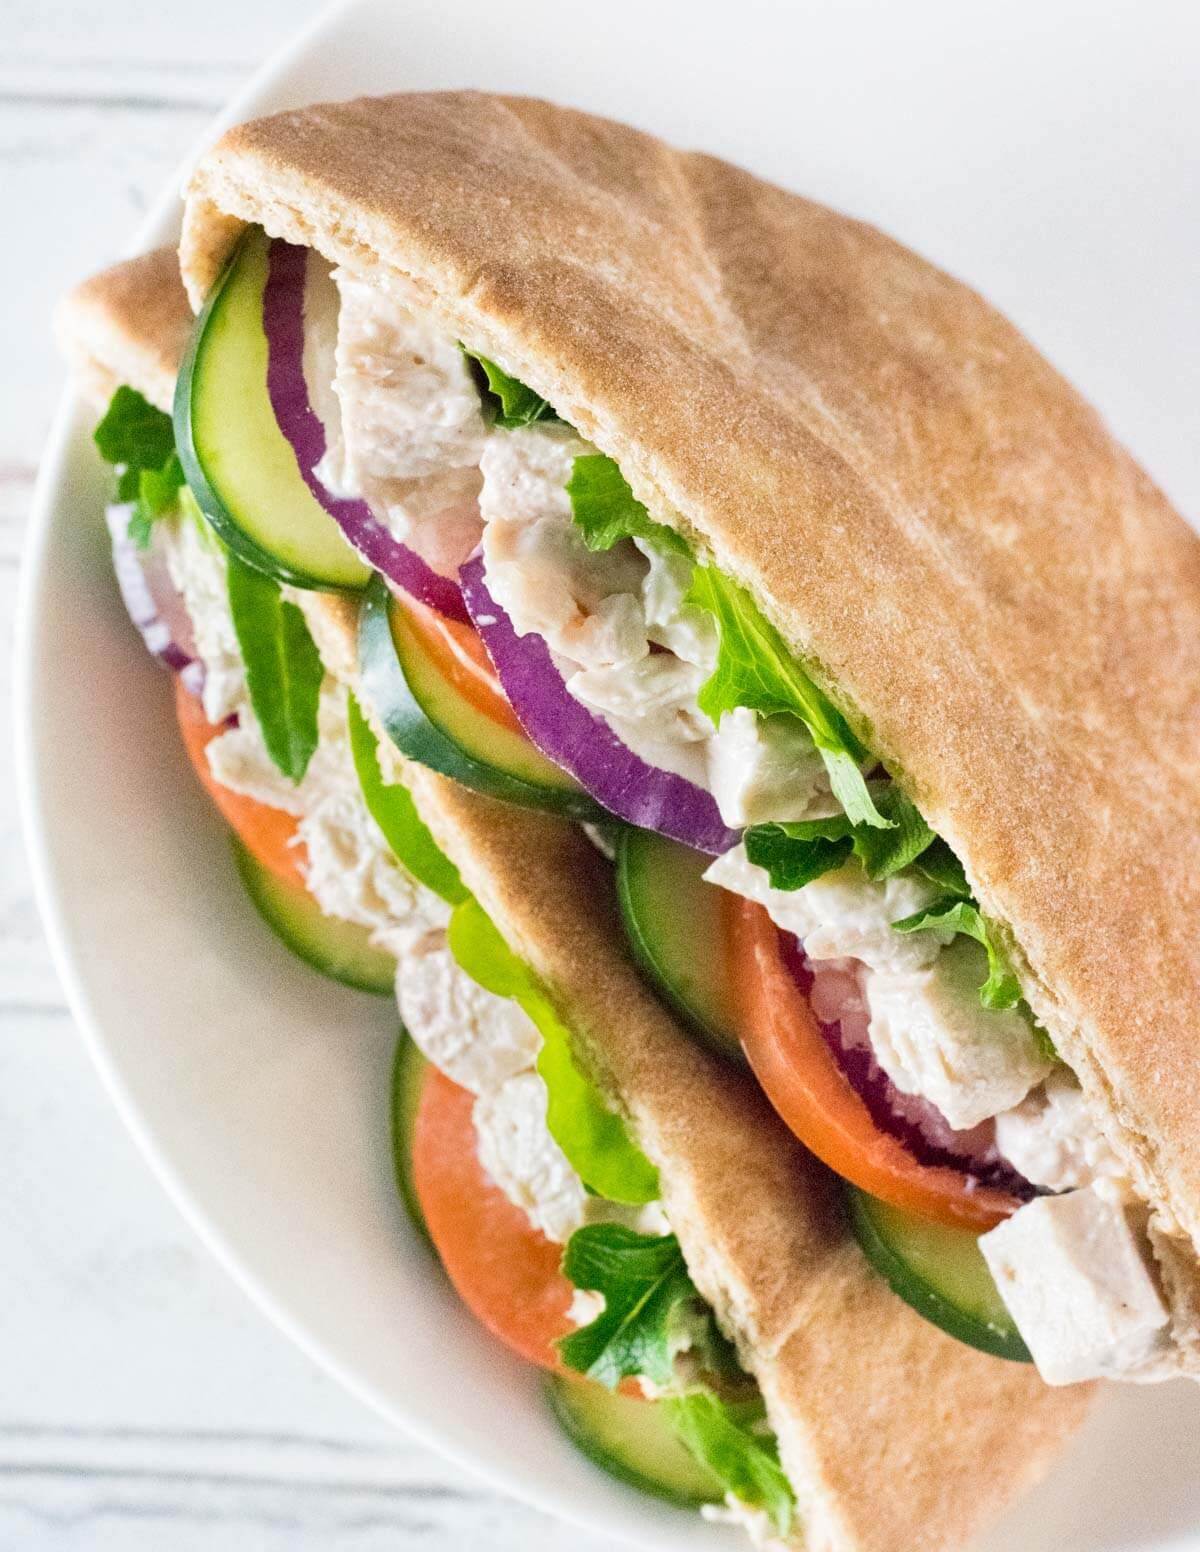 Easy chicken pitas with fresh veggies